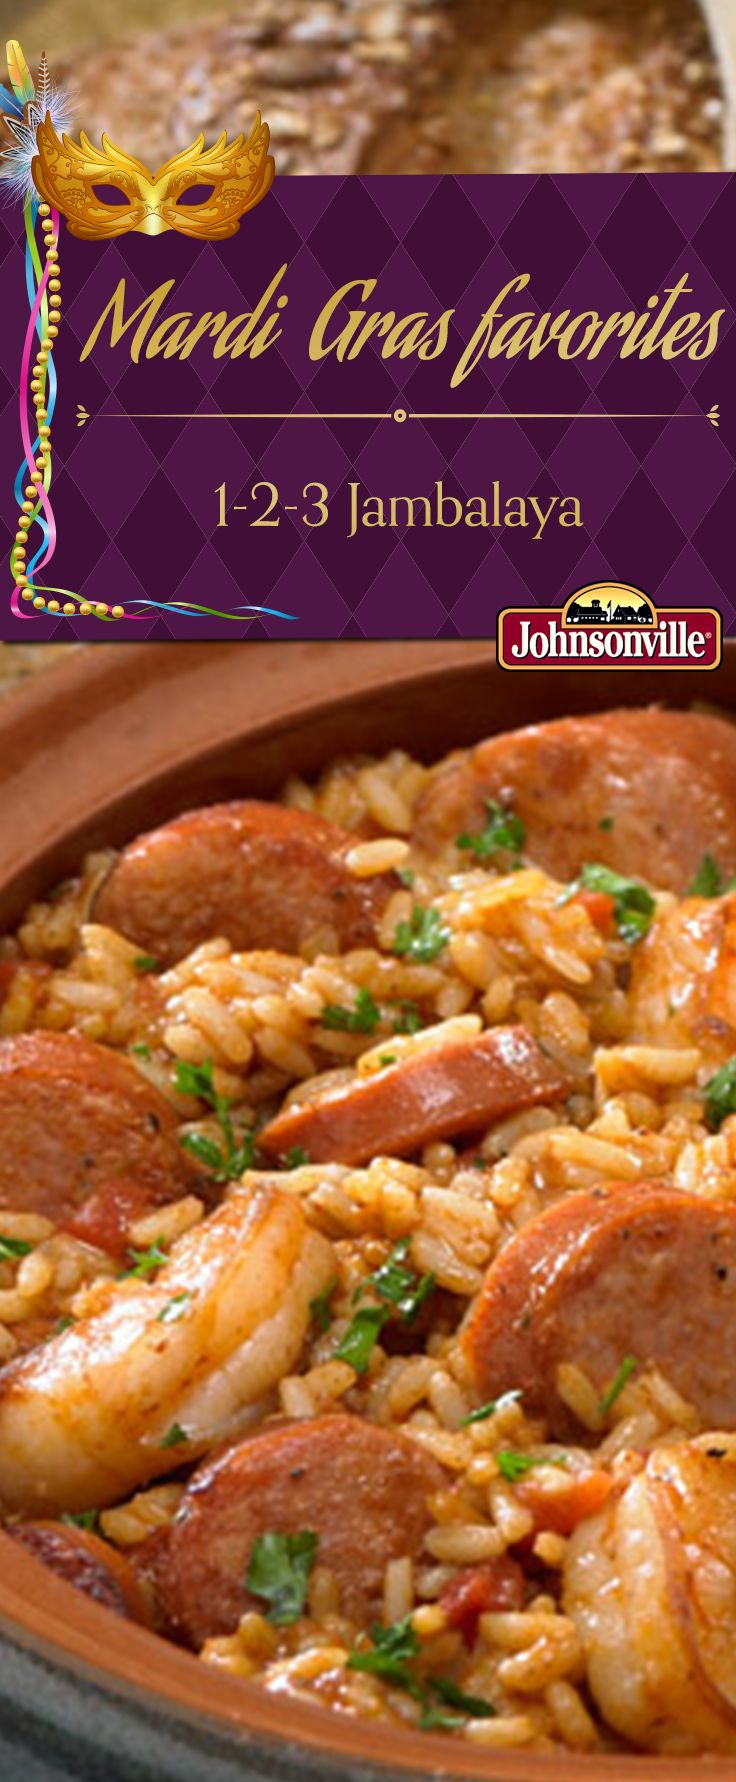 143 best cajun recipes images on pinterest cajun recipes pork celebrating mardi gras is easy with this 1 2 3 jambalaya recipe its forumfinder Choice Image